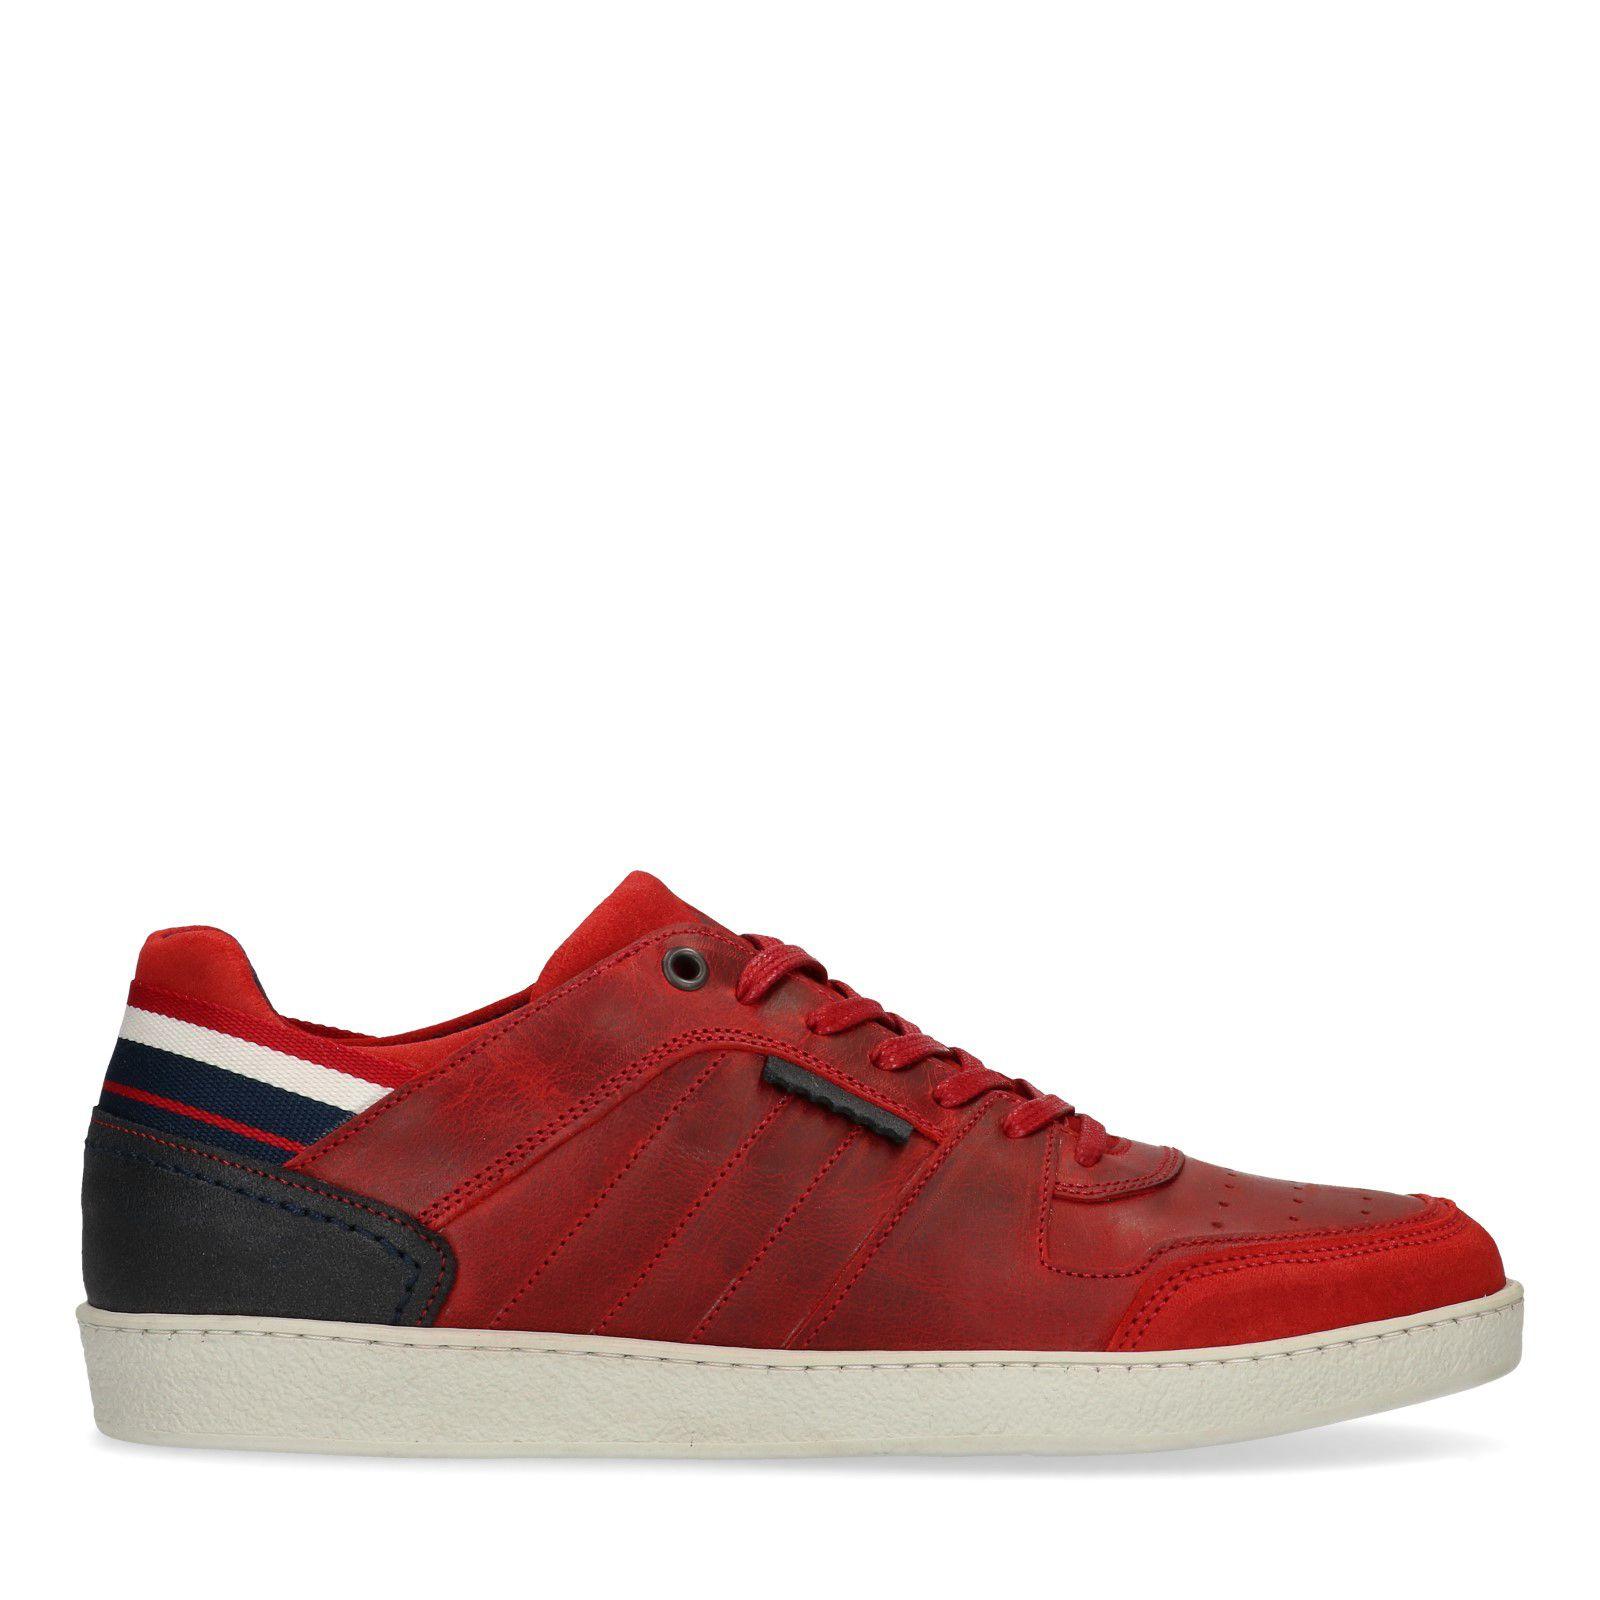 separation shoes 8a490 1f027 sacha-herenschoenen-leer-rood-4.8017_1.jpg